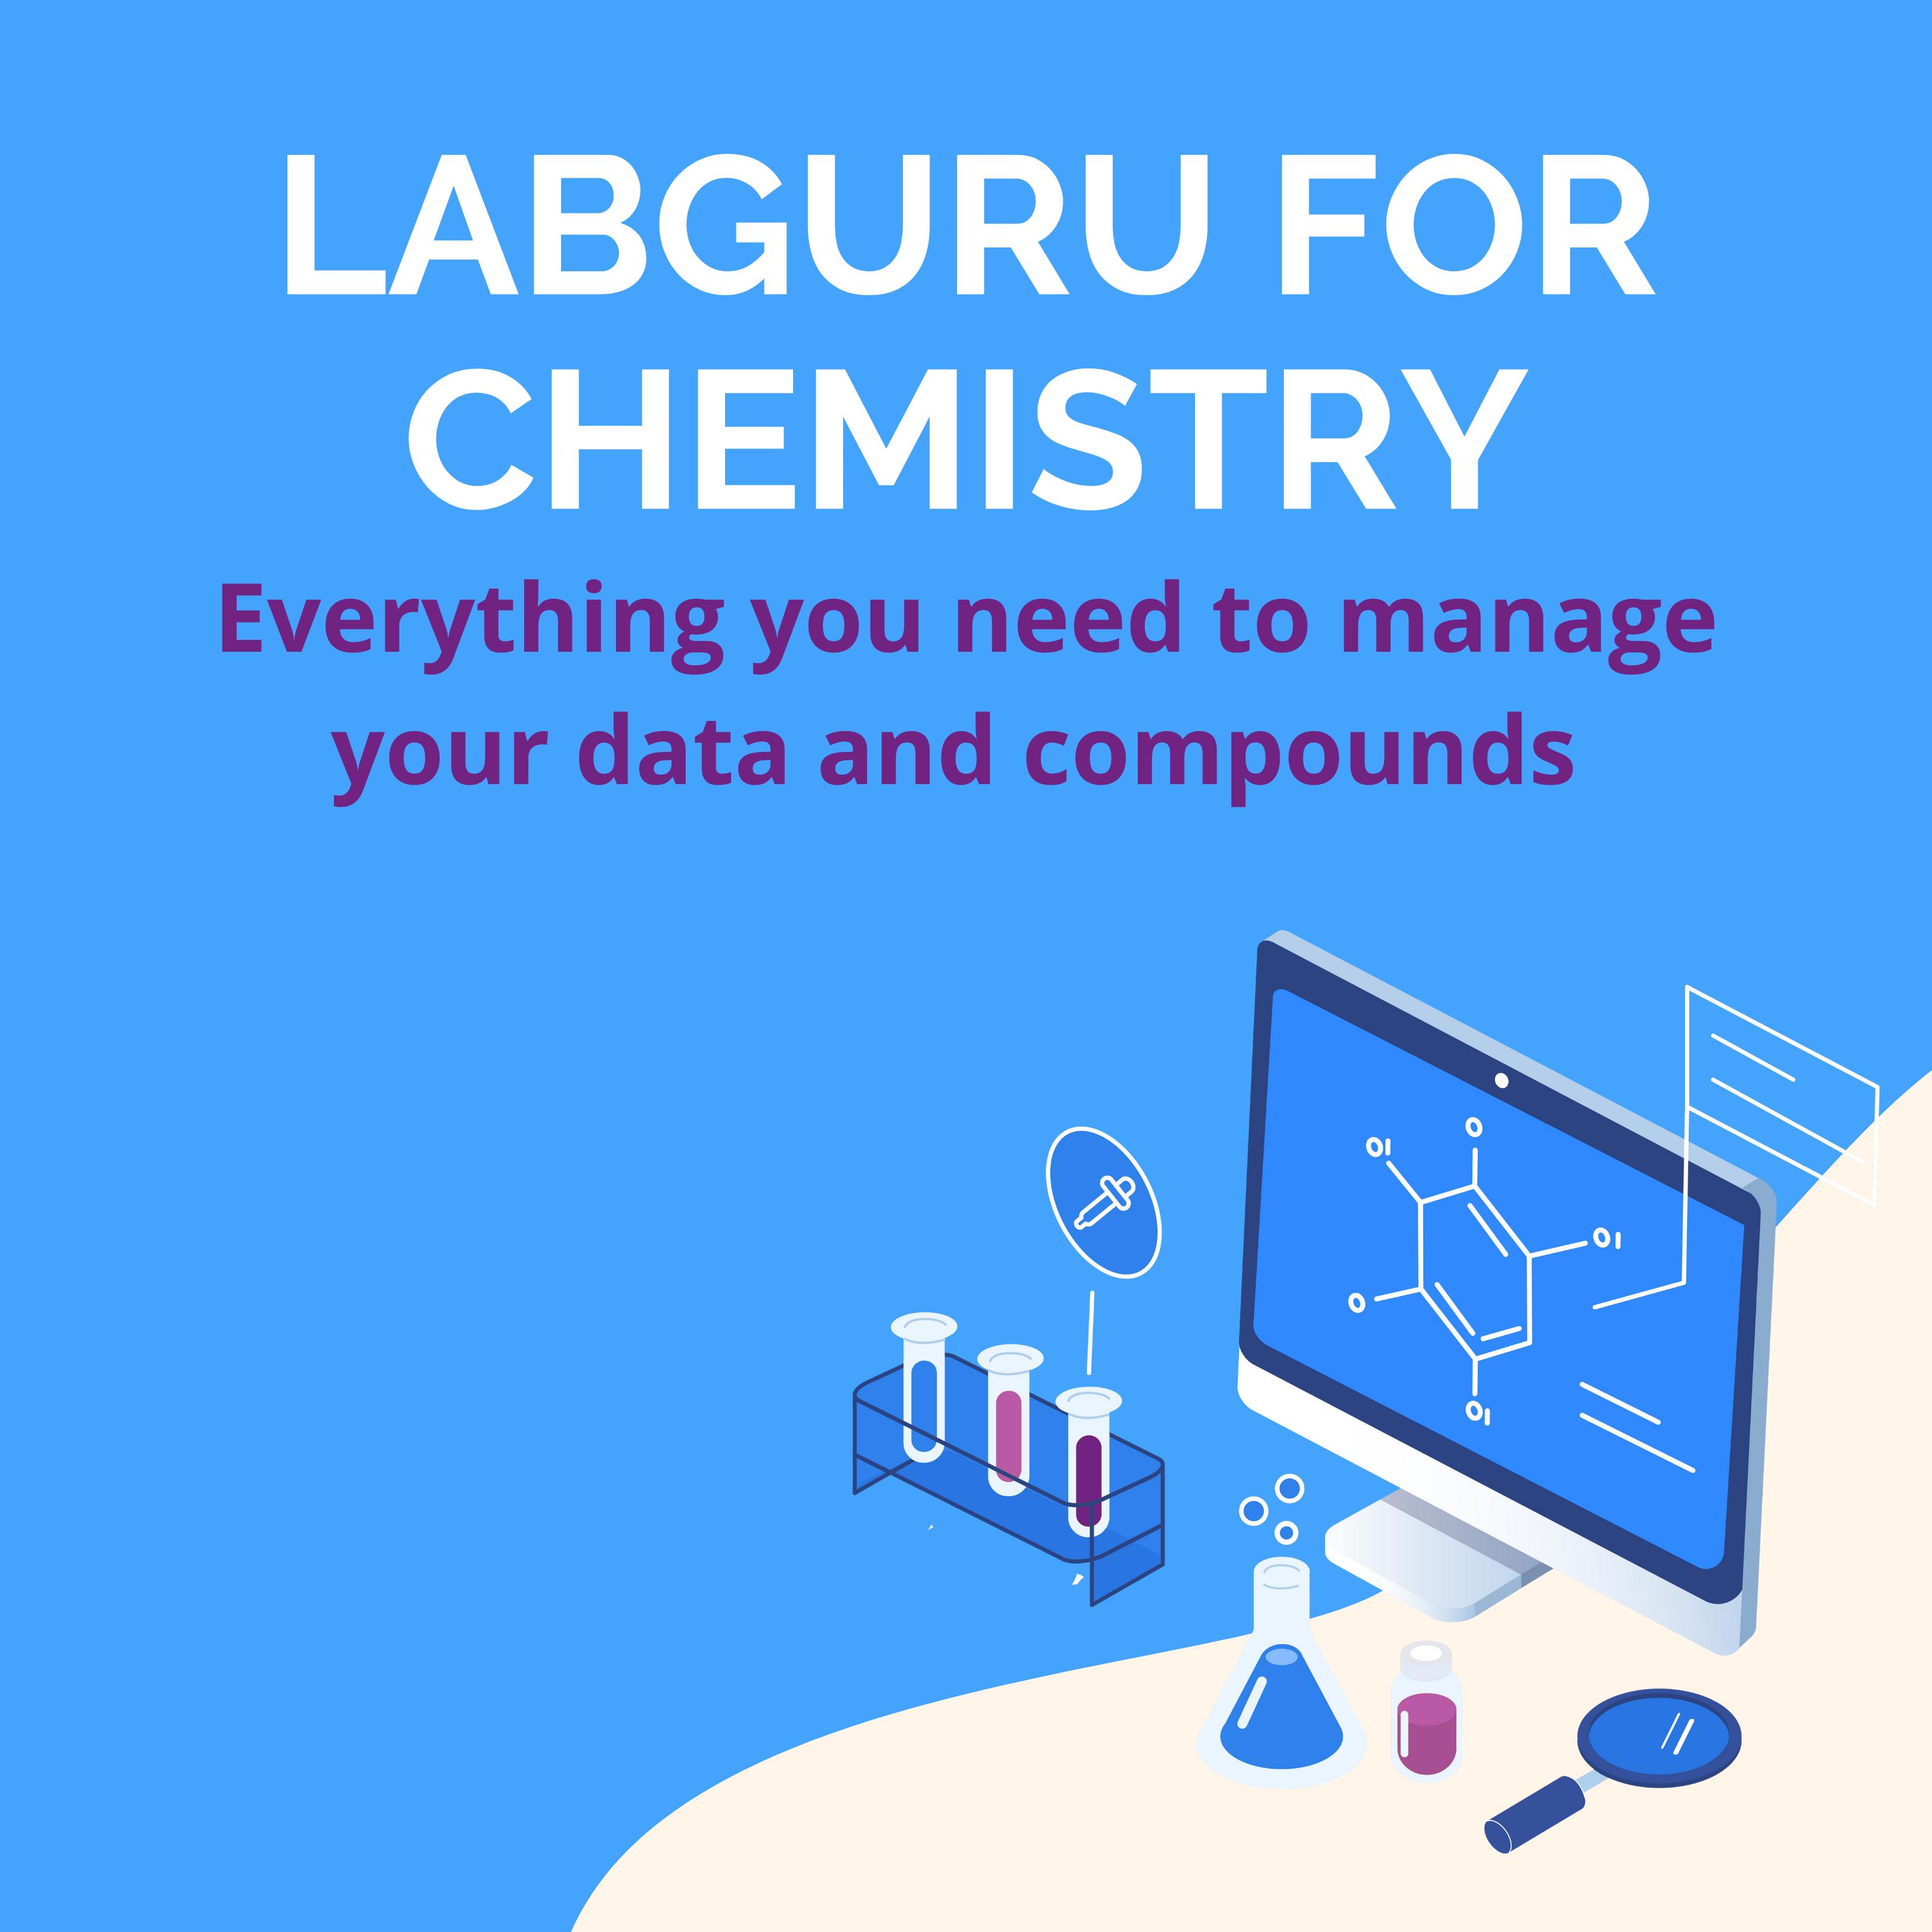 Labguru for Chemistry